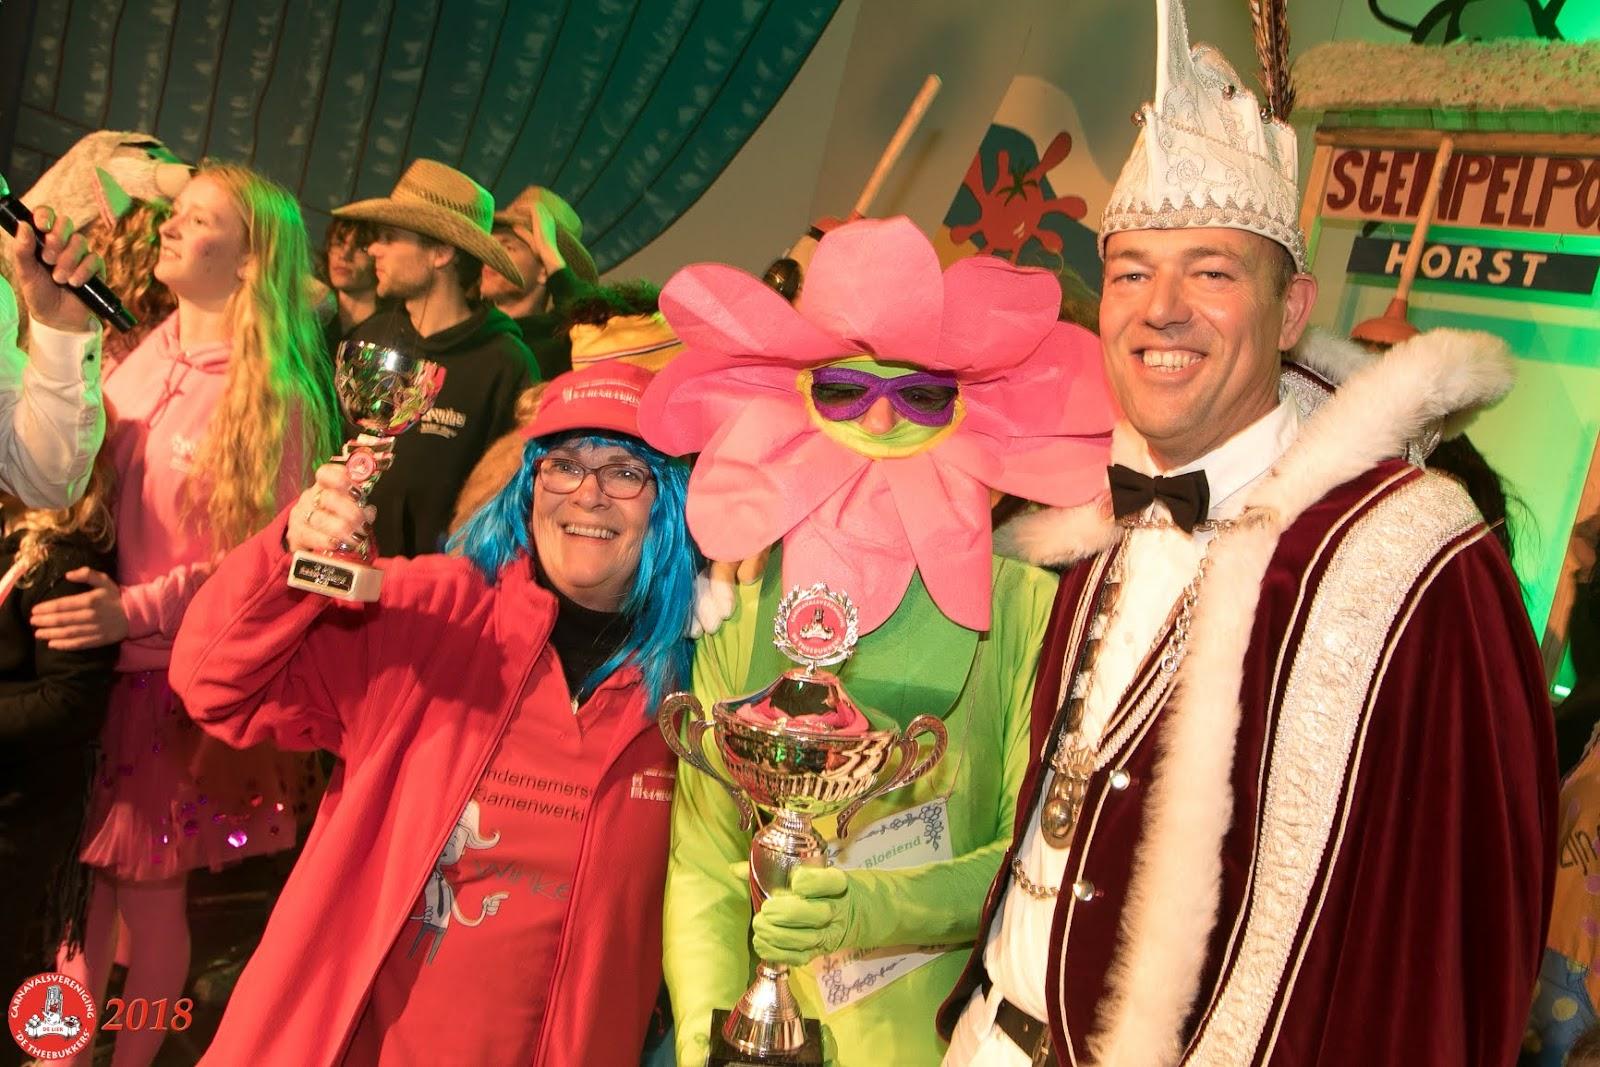 a Familie Carnaval 2018 - FamilieCarnavalTheebukkers2018-2023.jpg